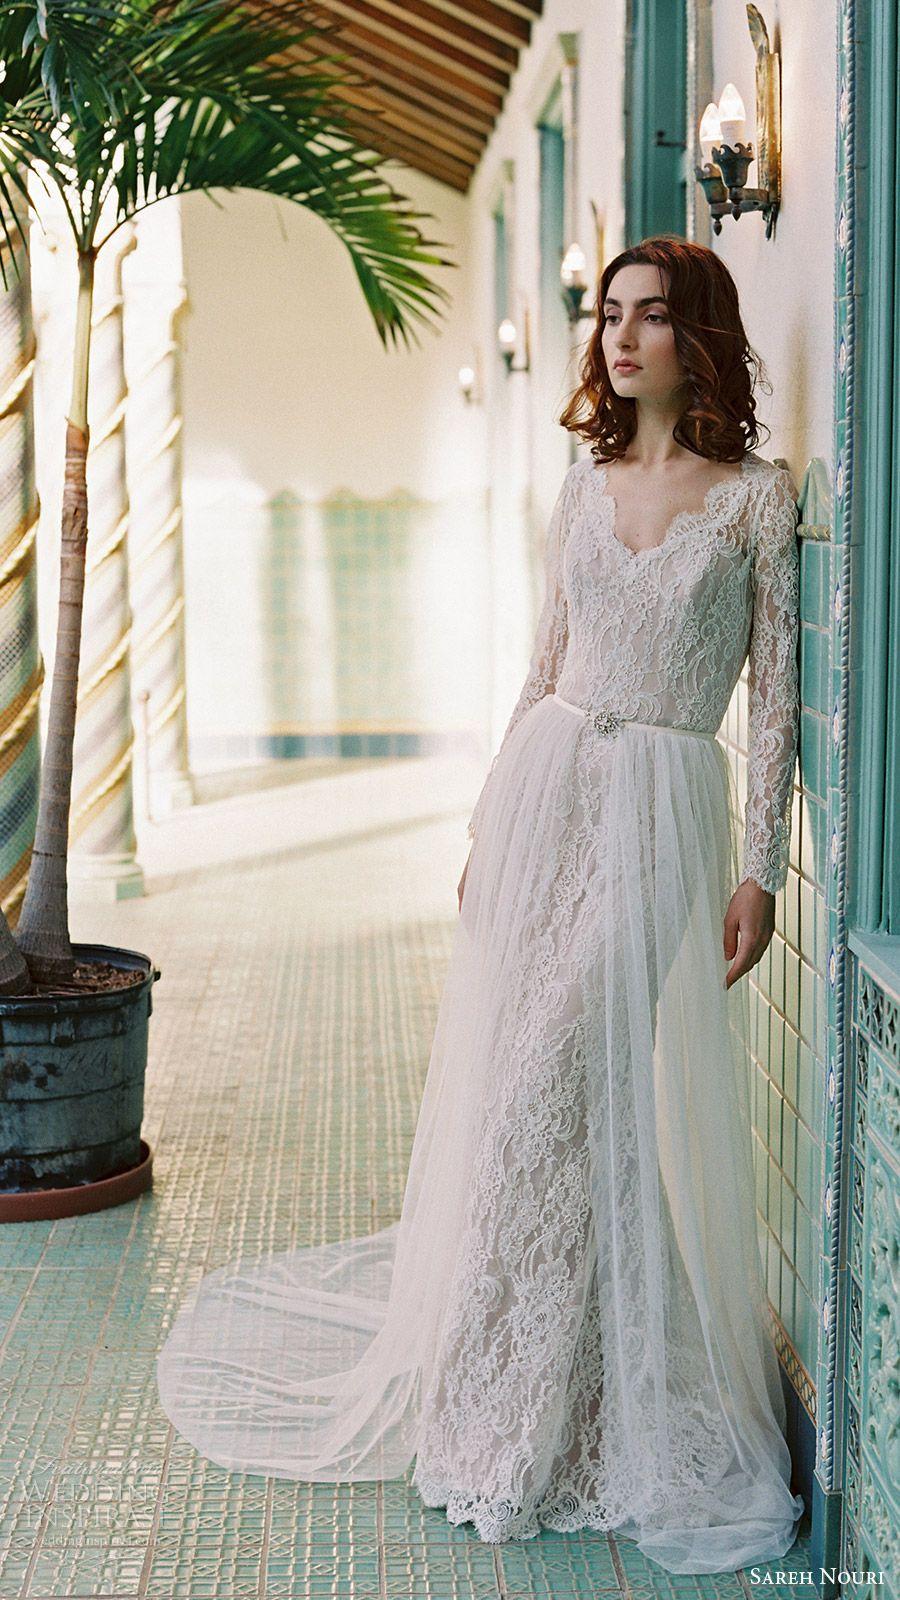 Sareh nouri bridal spring wedding dresses romantic wedding